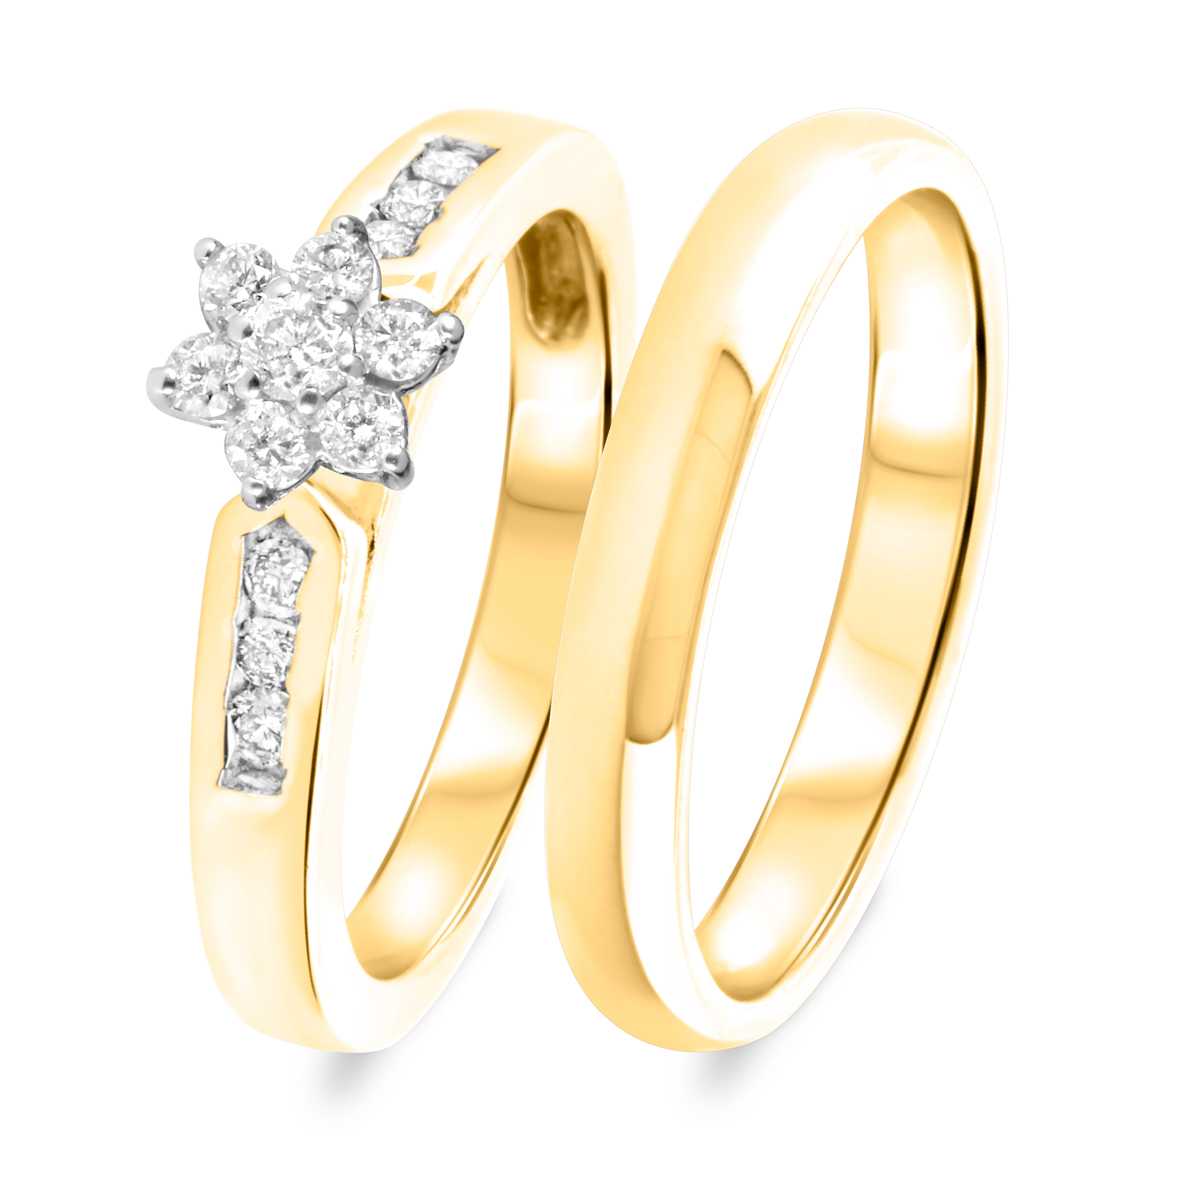 1/2 CT. T.W. Diamond Women's Bridal Wedding Ring Set 14K Yellow Gold